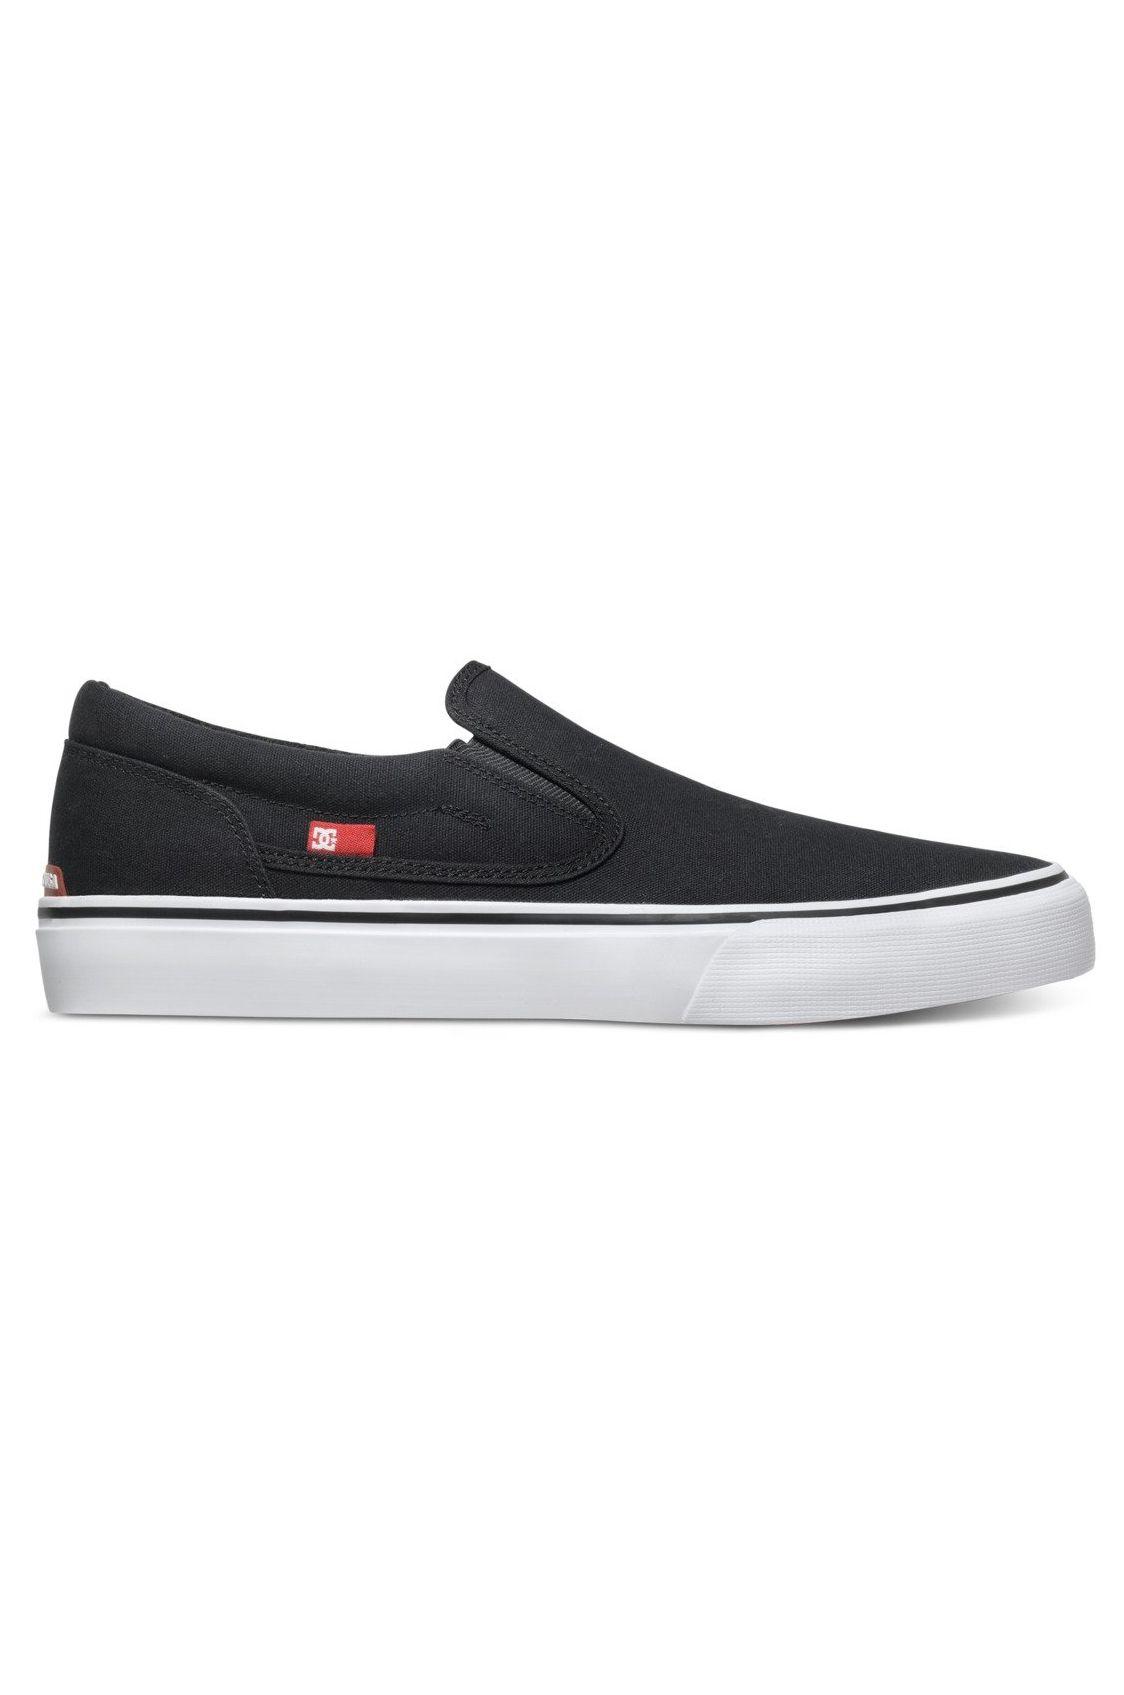 DC Shoes Shoes TRASE SLIP-ON TX Black/White